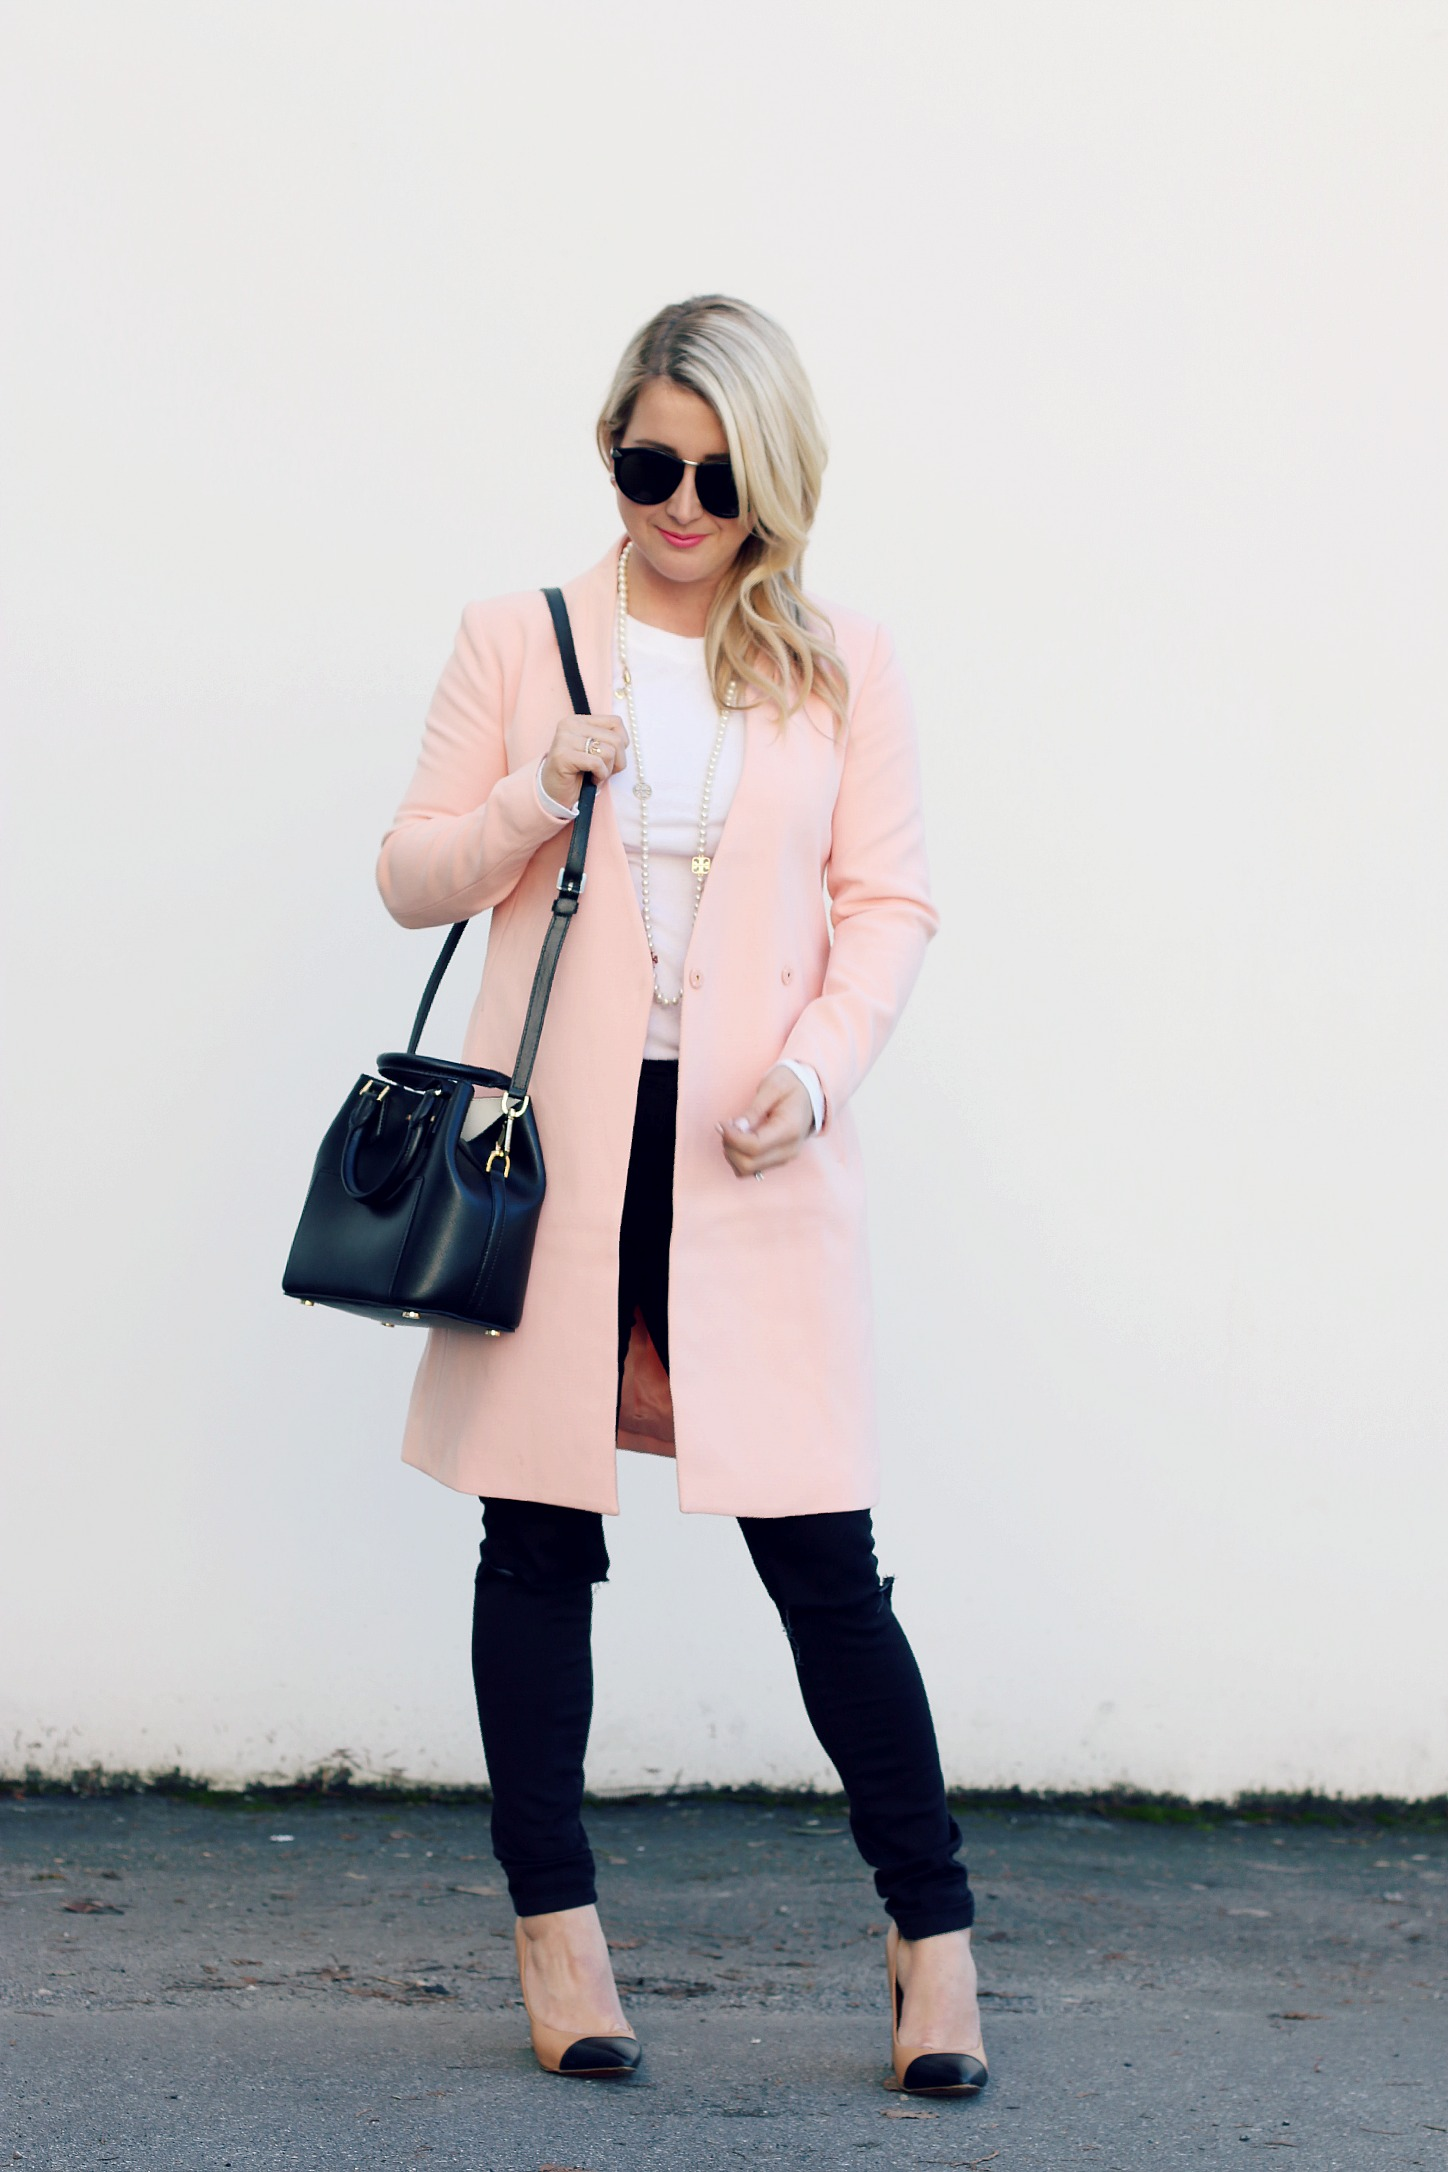 Michael Kors Purse Pink Coat Monika Hibbs